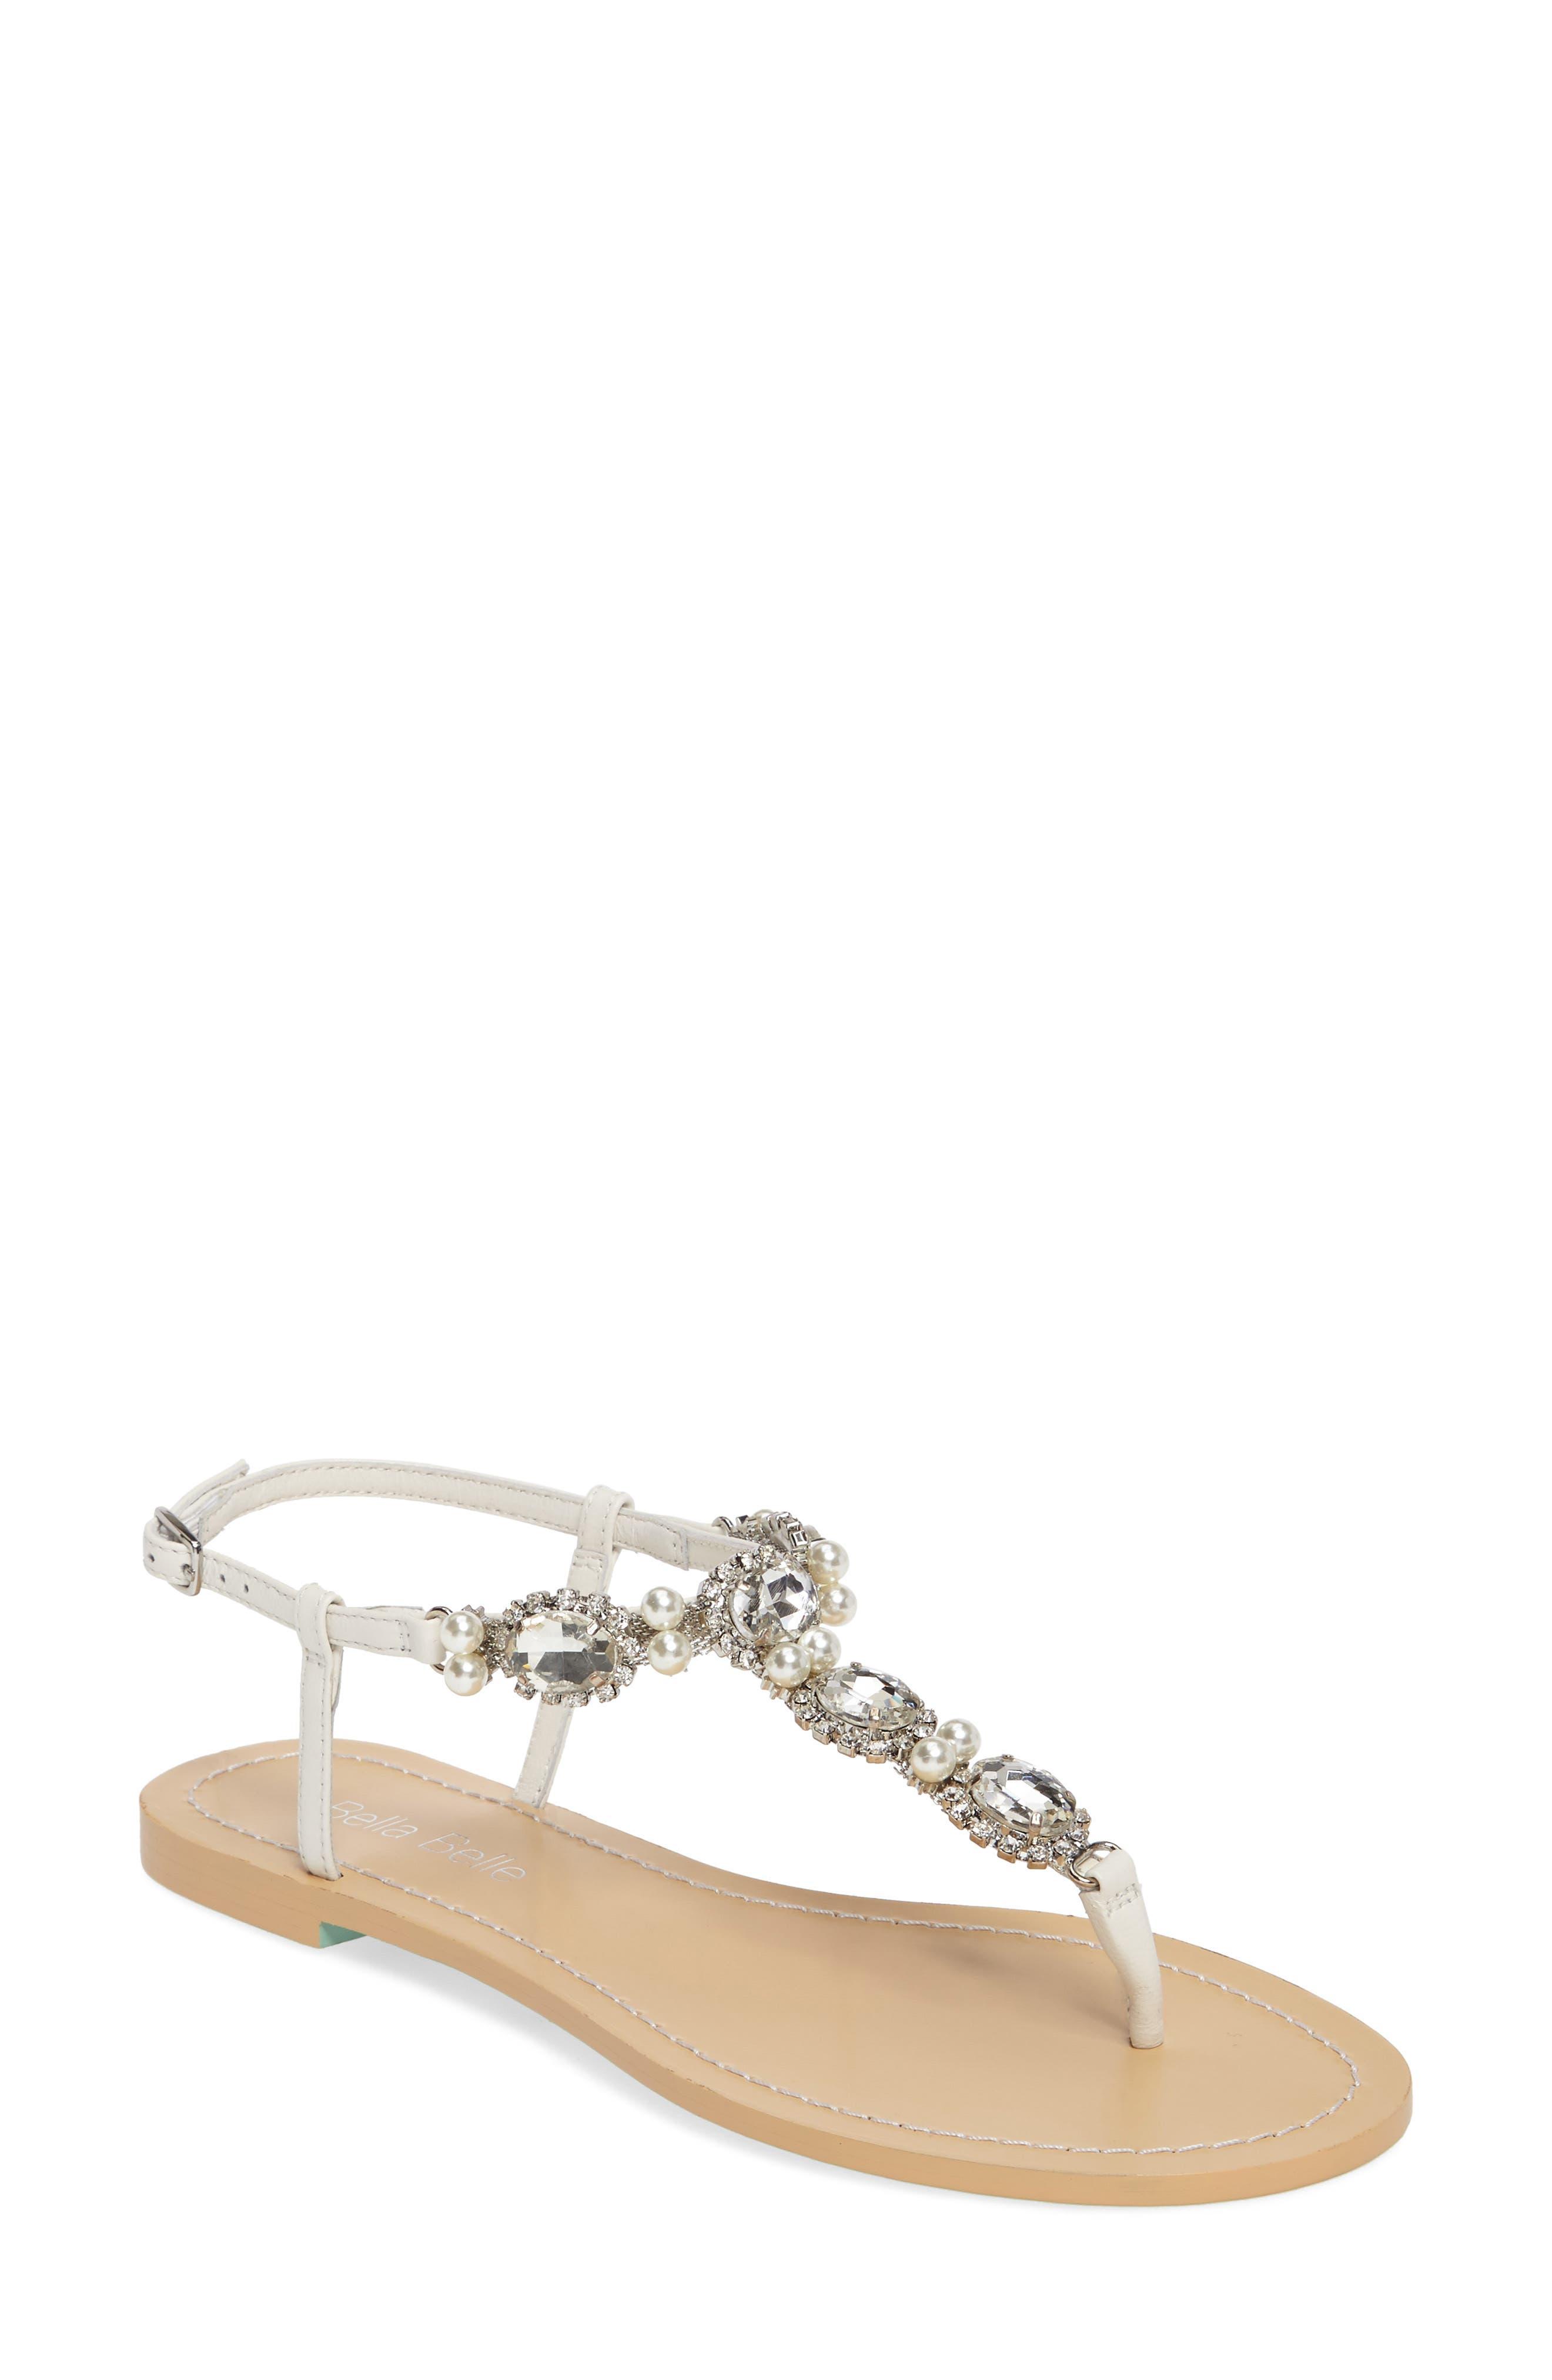 Main Image - Bella Belle Hera Embellished T-Strap Sandal (Women)